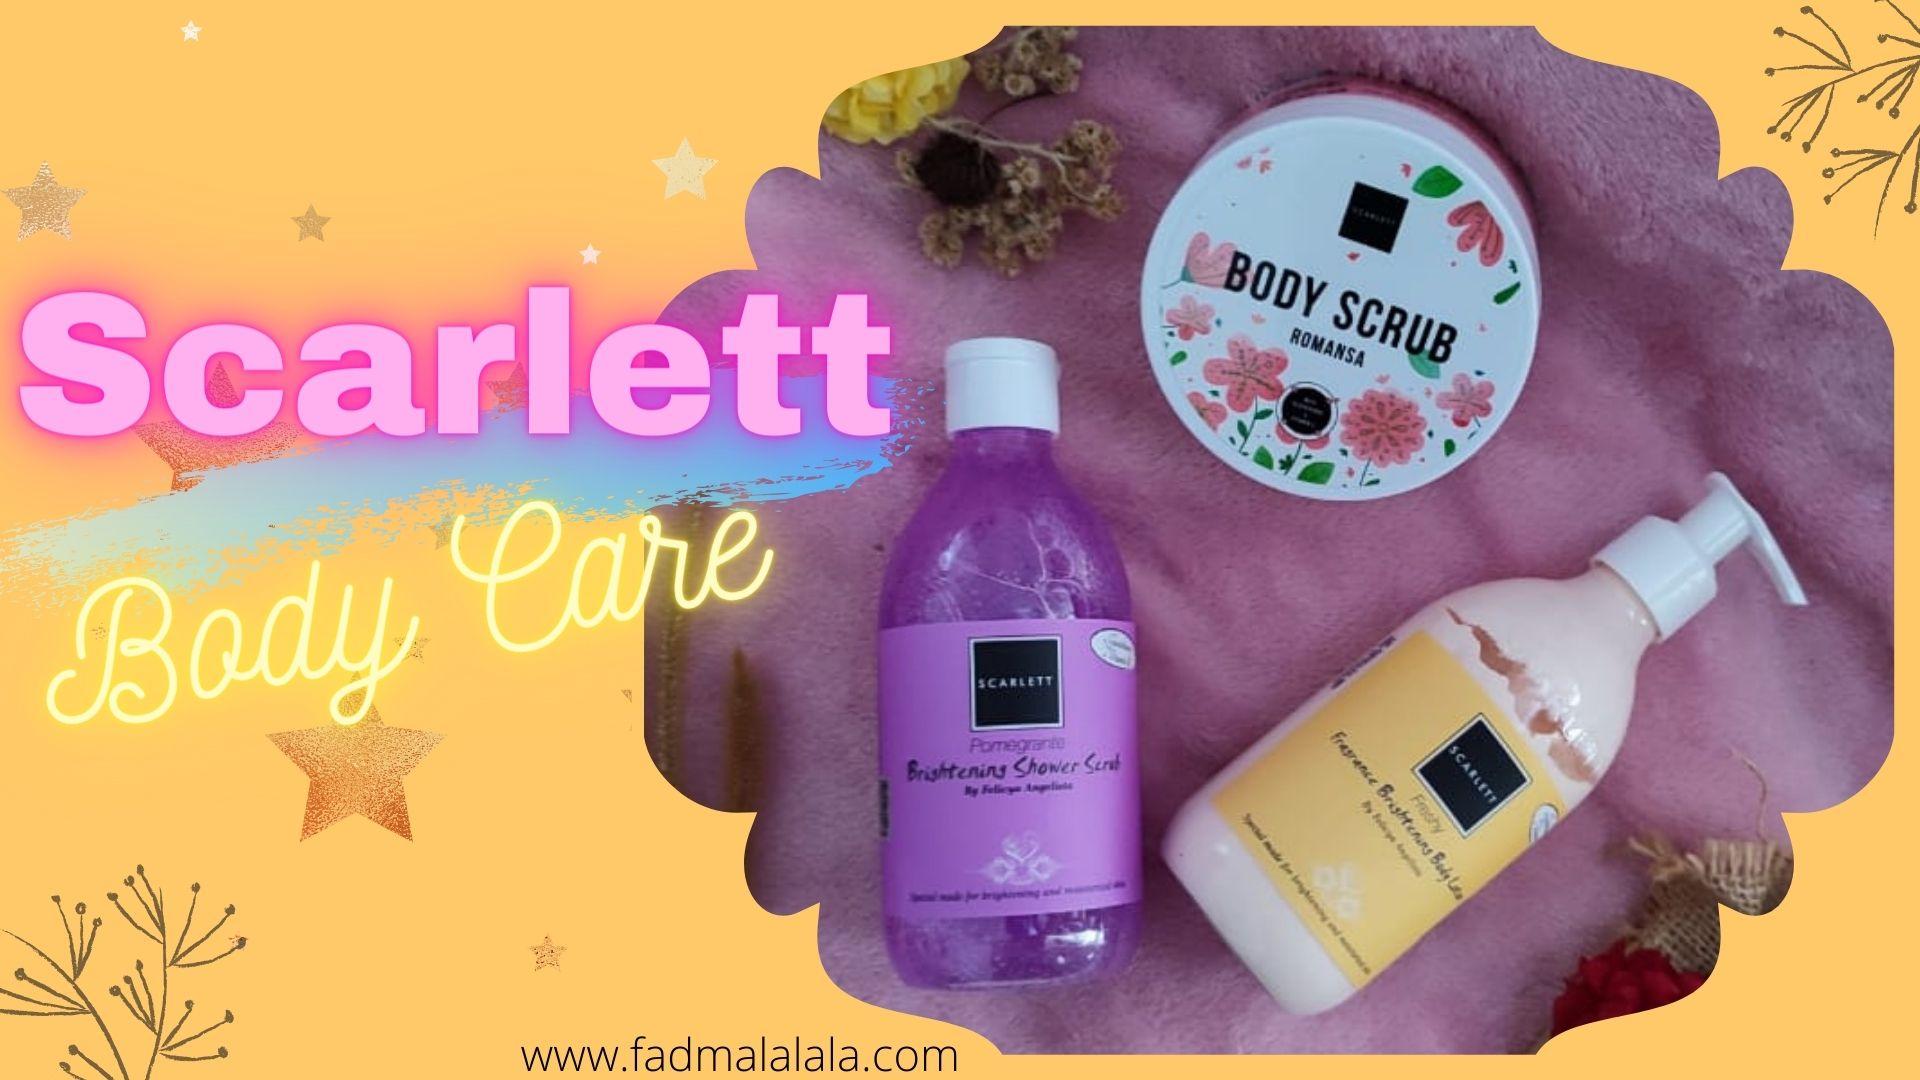 Scarlett Body Care